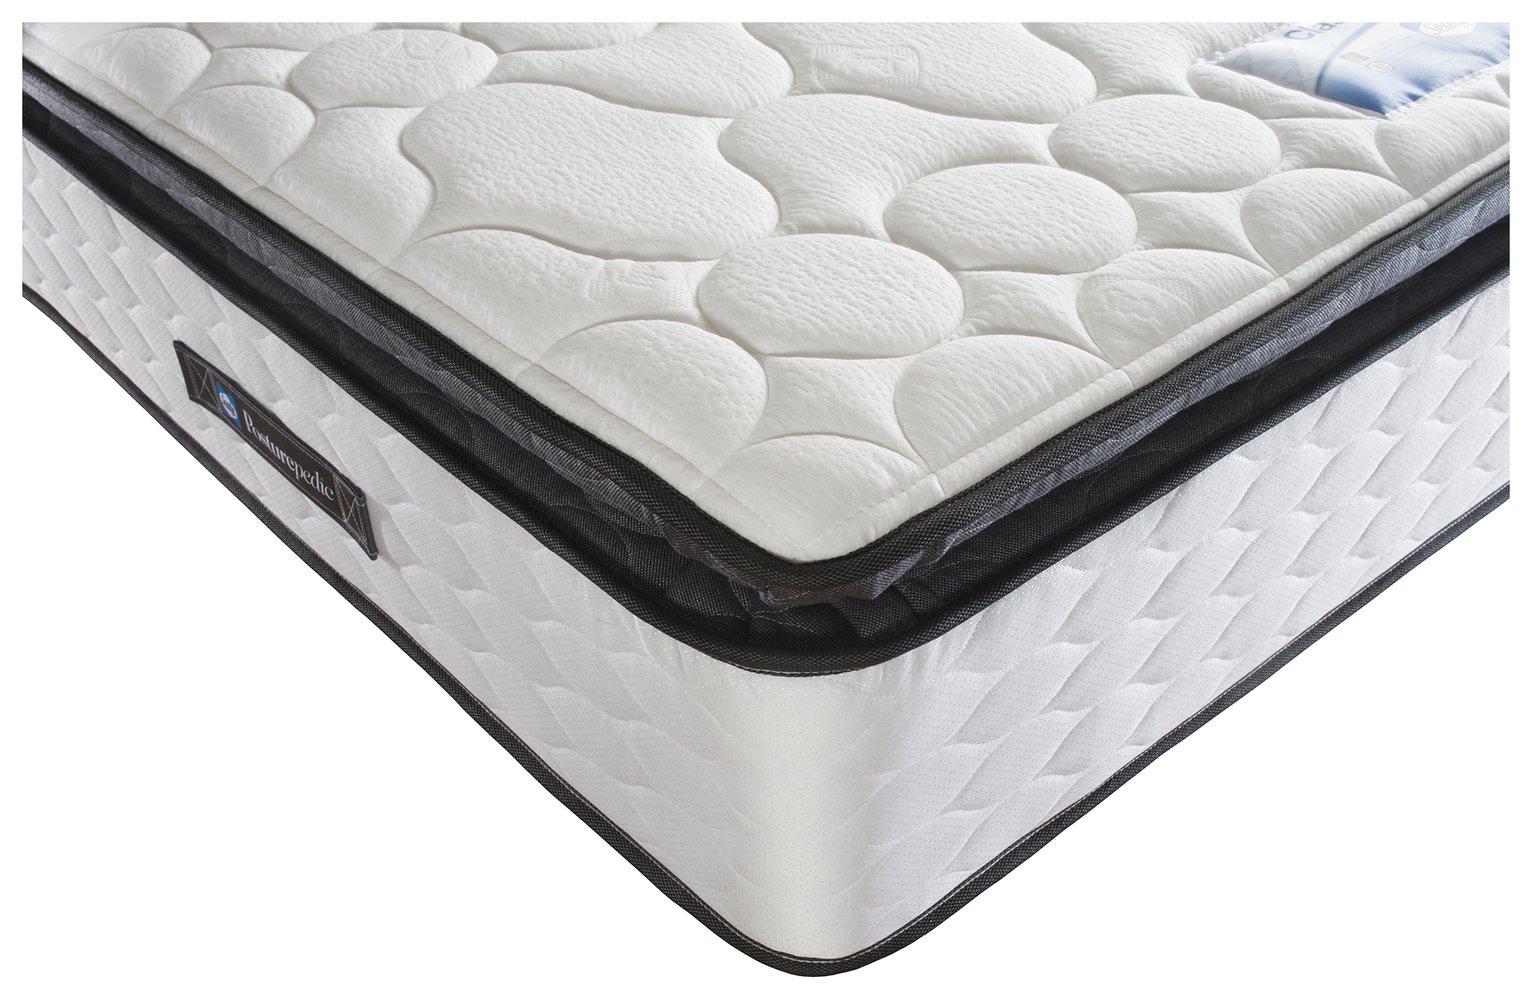 Sealy Repose Pillowtop Memory Foam Superking Mattress